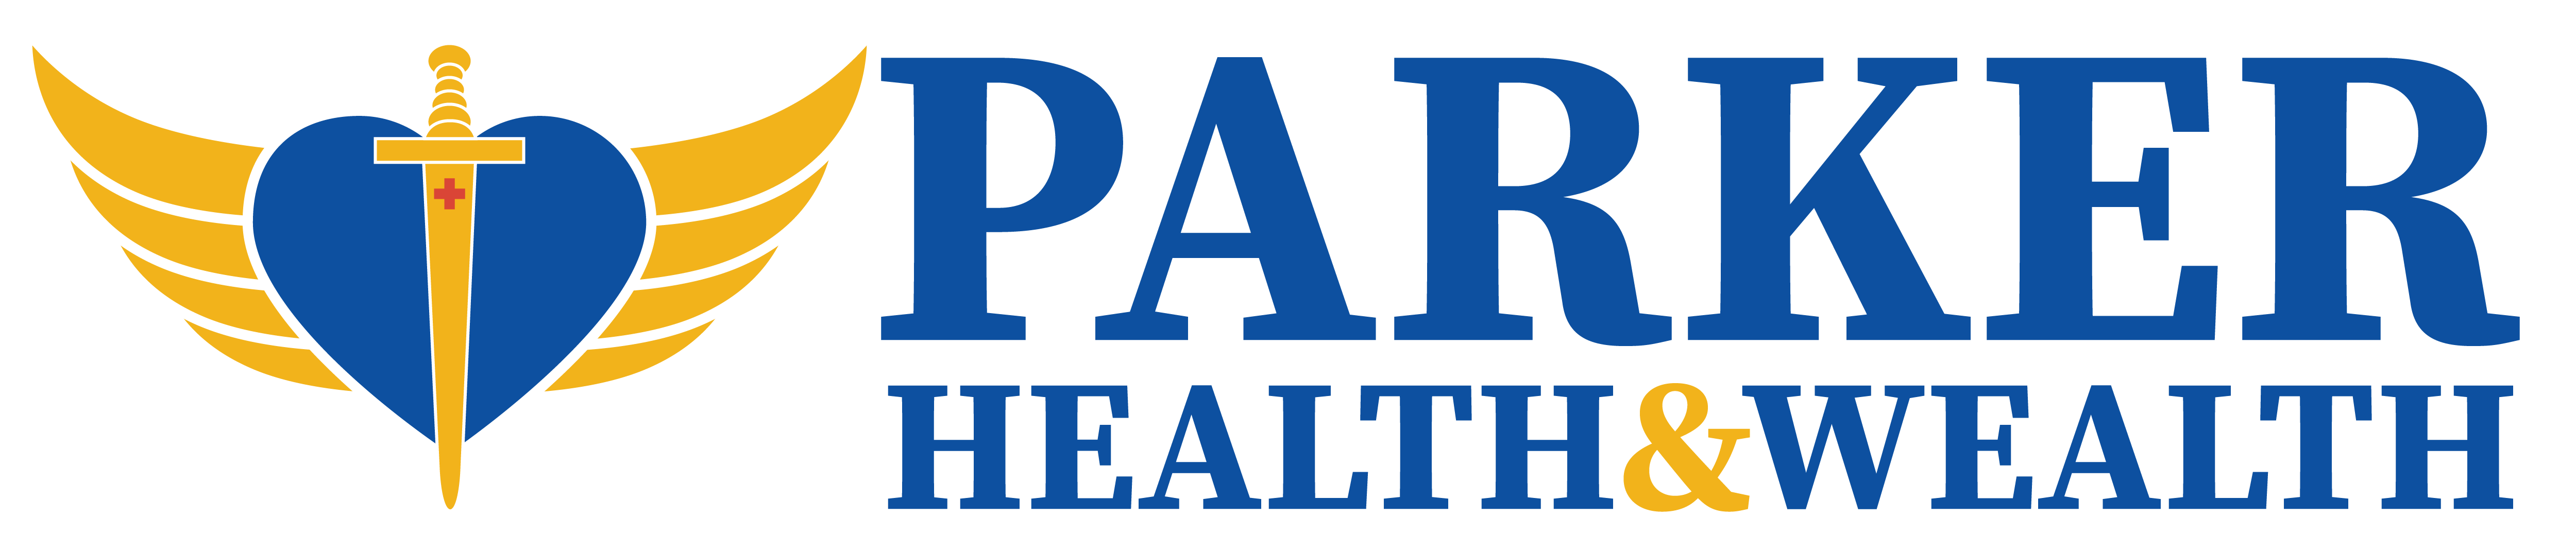 Parker Health & Wealth